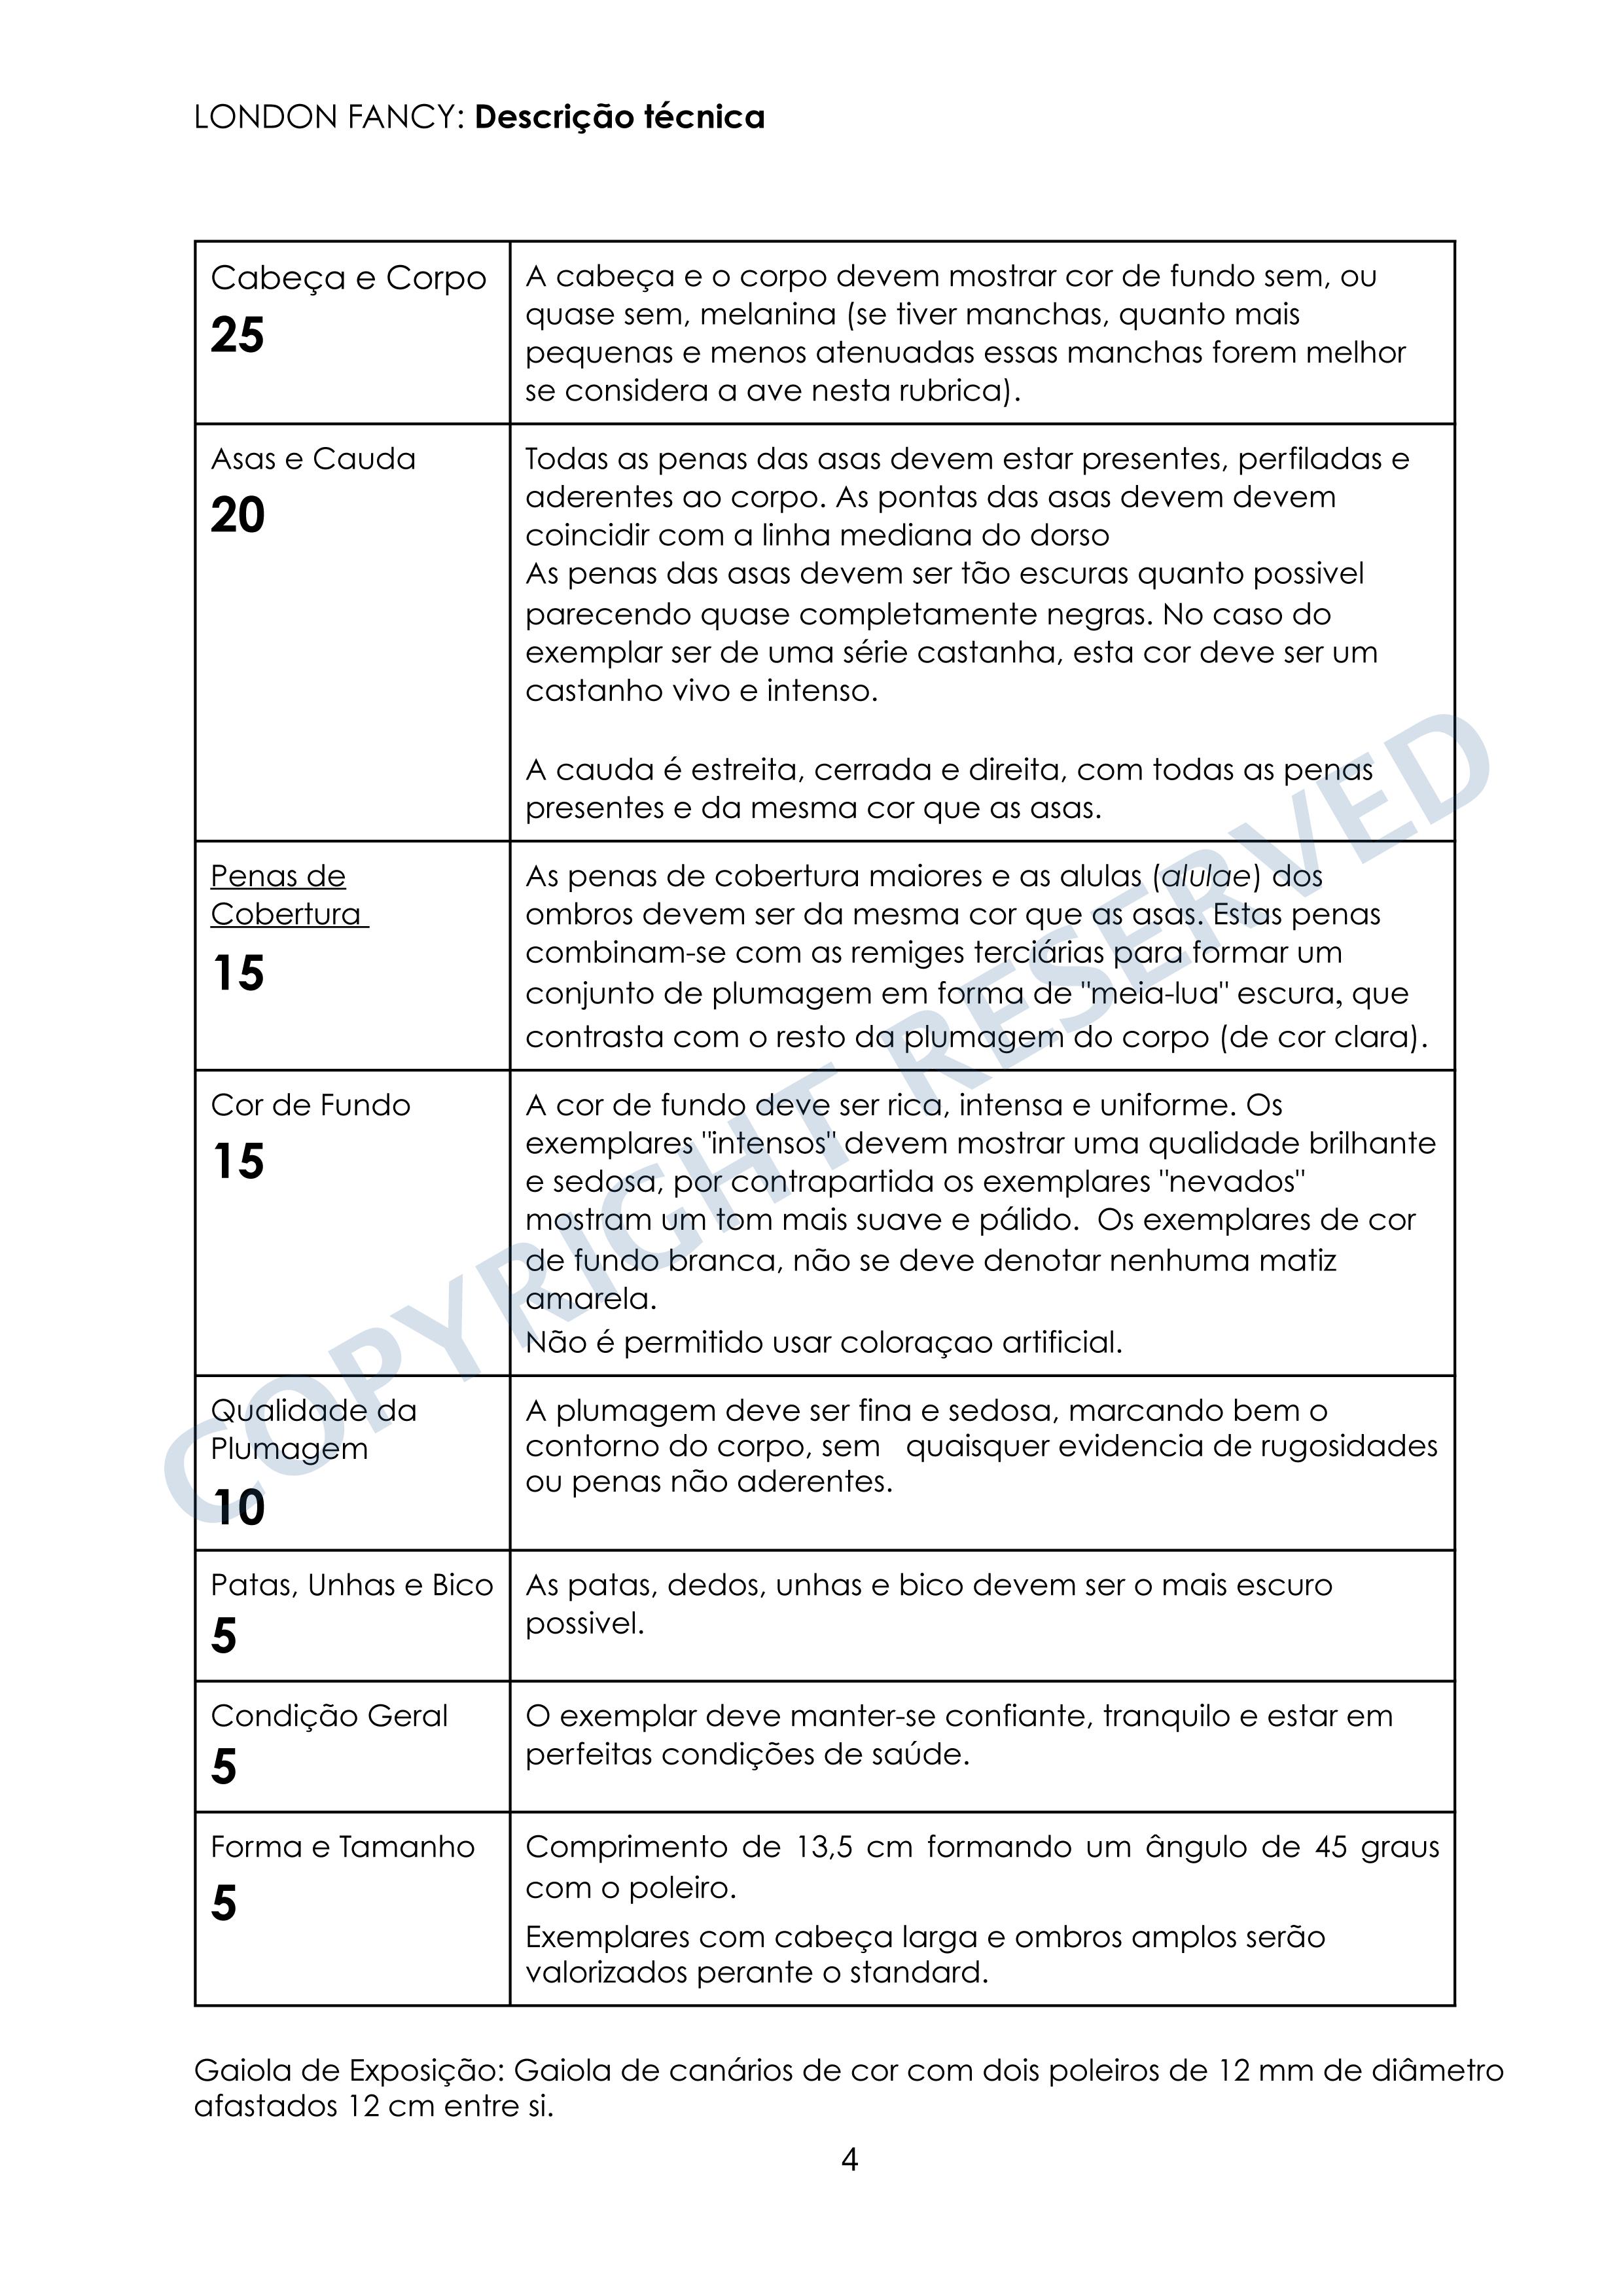 LF standard-Tech Descrn PORTUGUESE